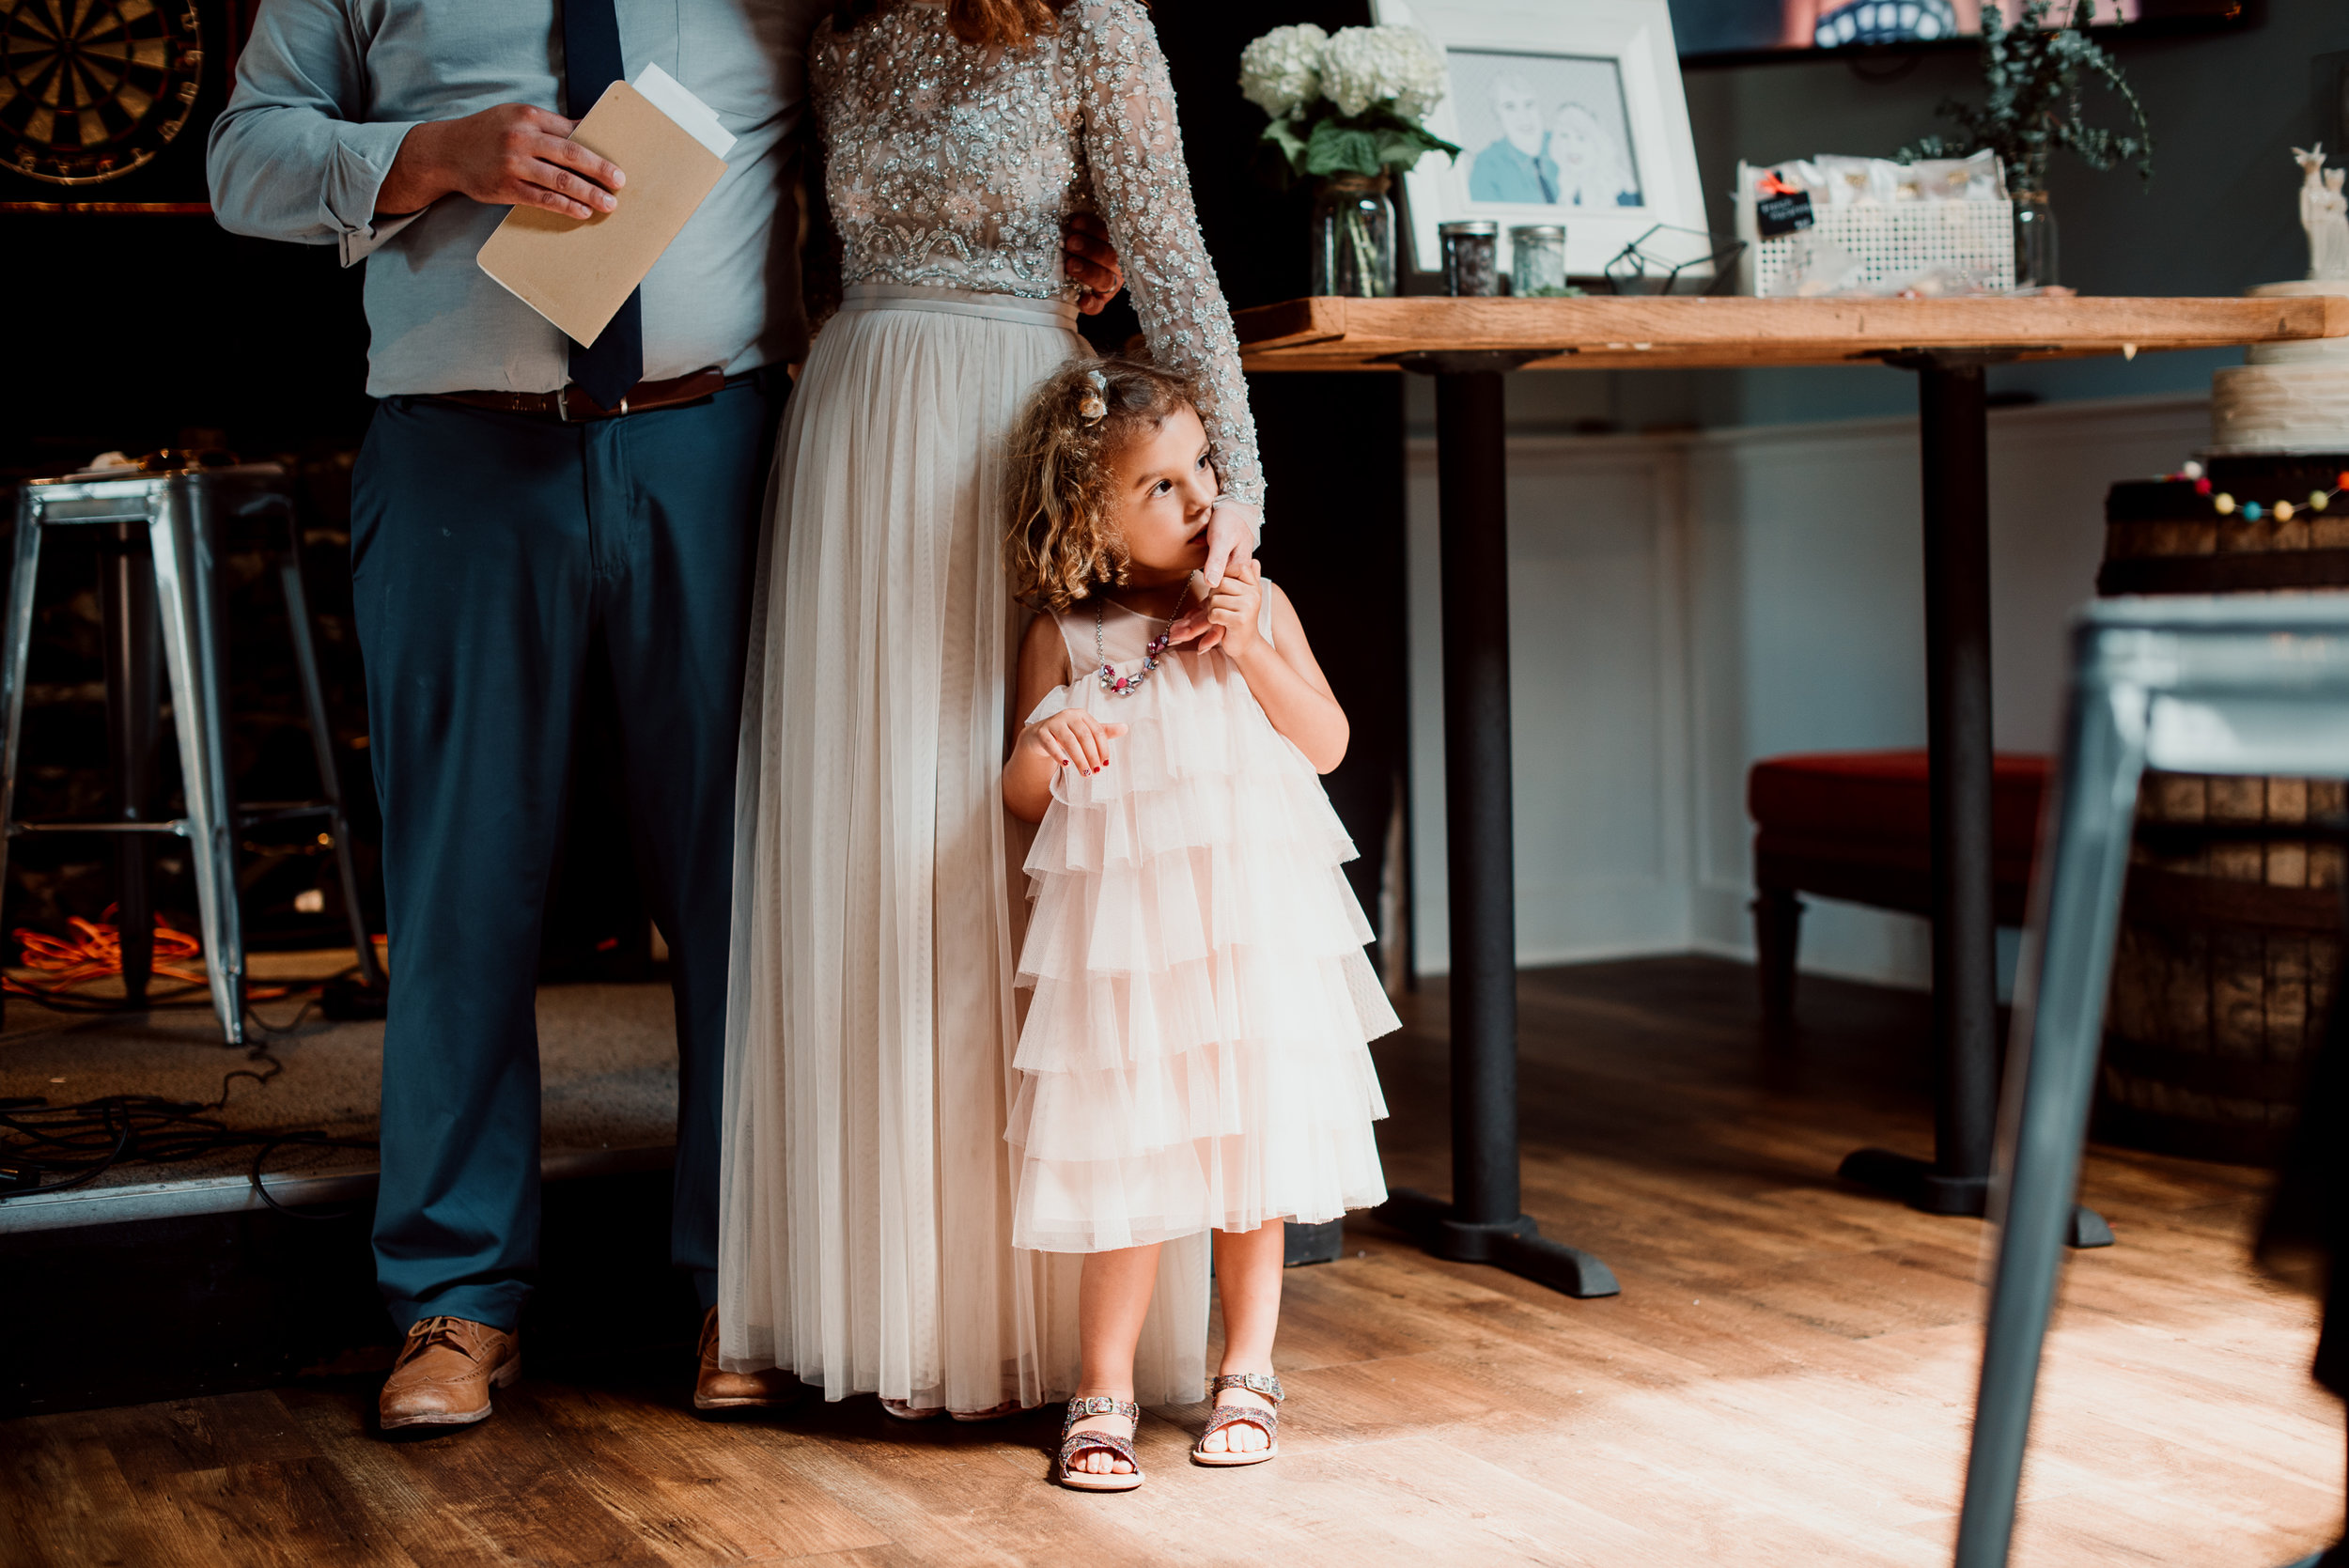 Philadelphia-wedding-photographer-la-cabra-brewery-diy-Peaberry-Photography-035.jpg